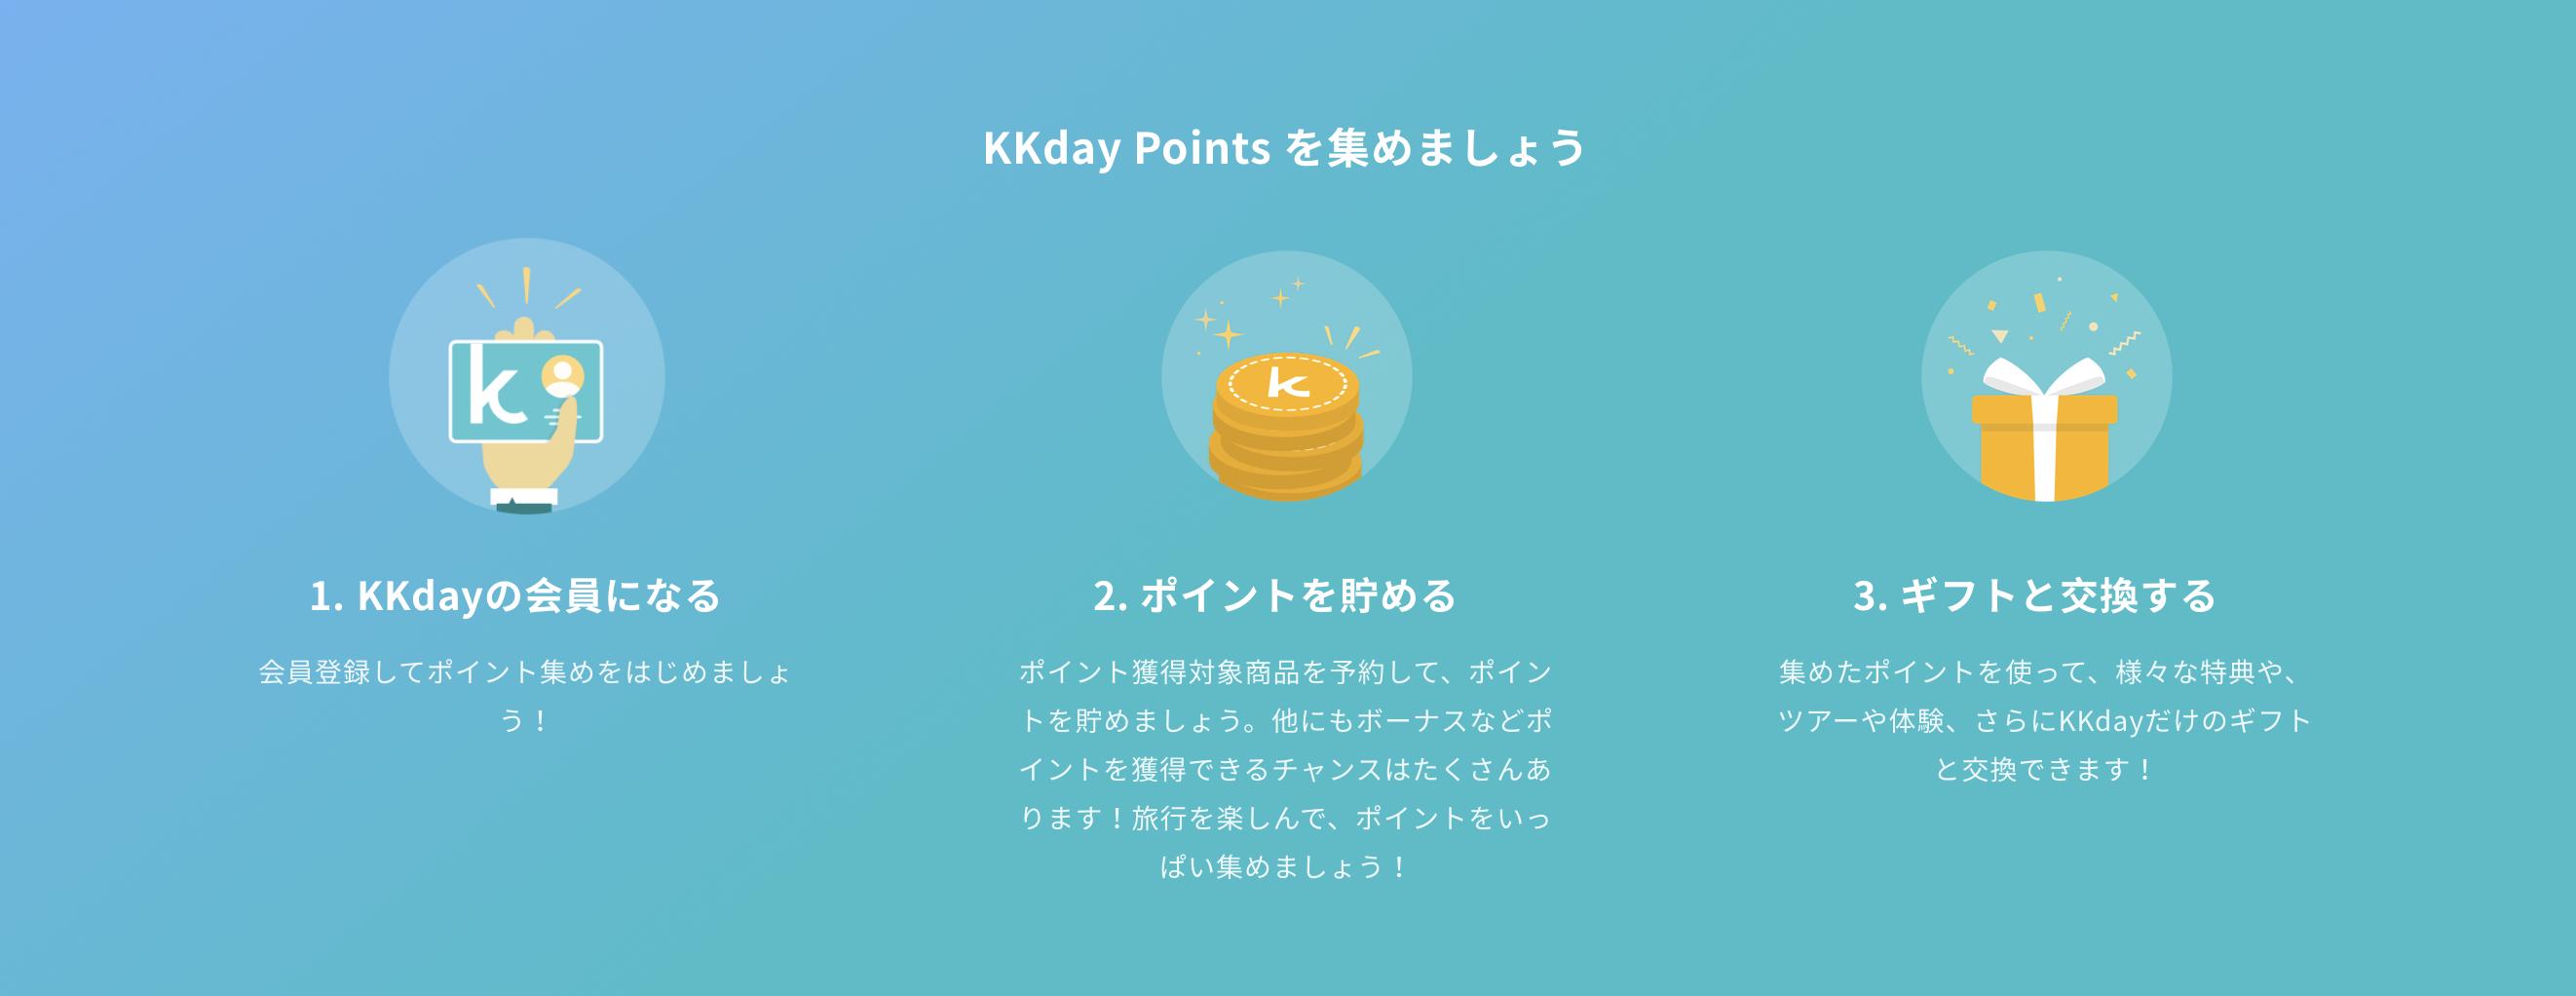 kkdayのポイント制度